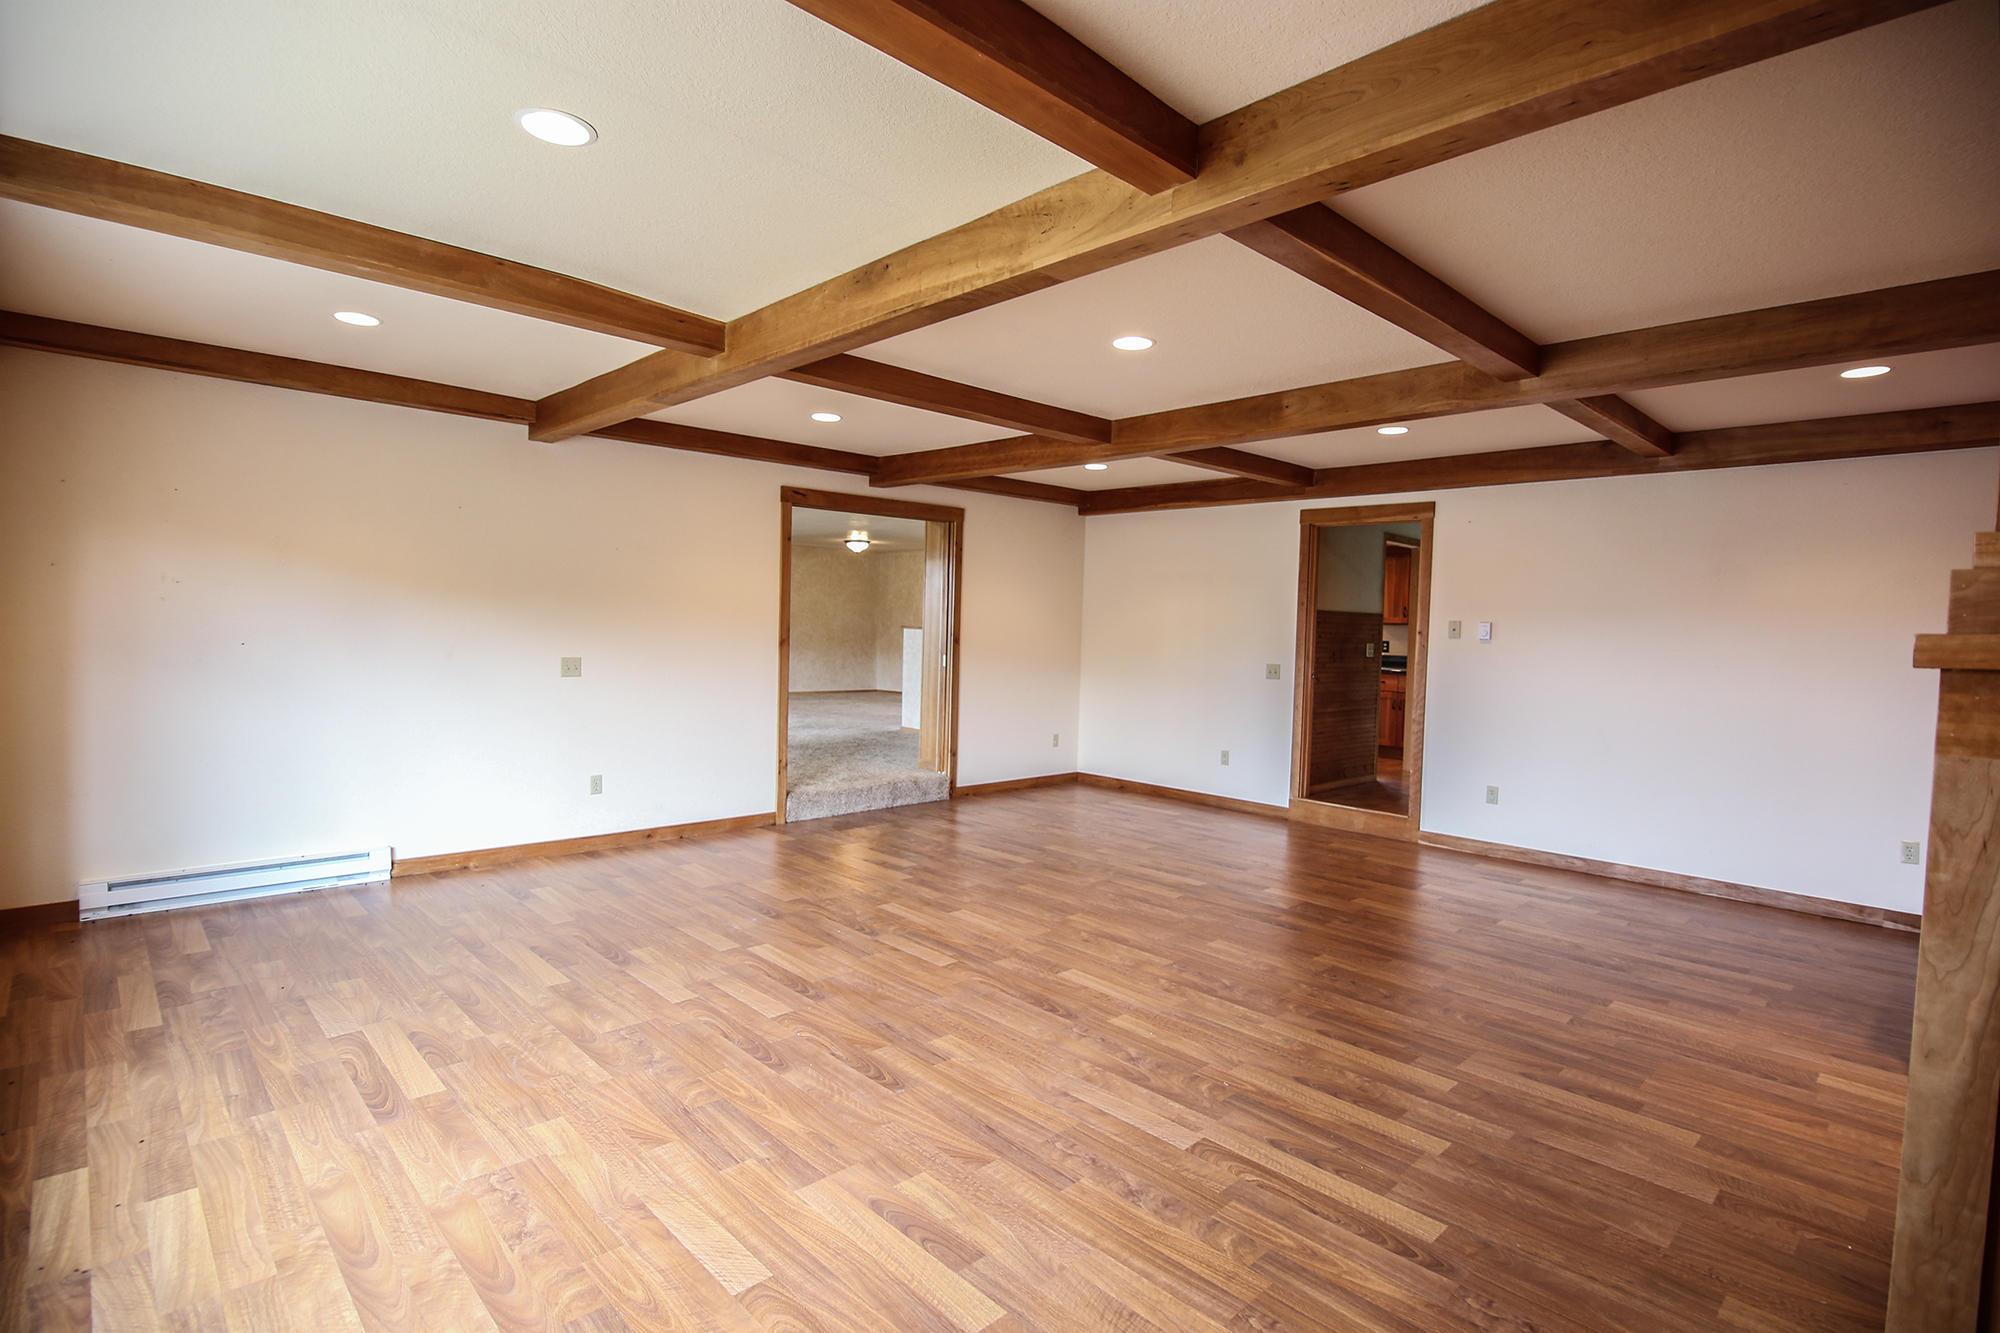 23 Harlequin Drive, Sheridan, Wyoming 82801, 3 Bedrooms Bedrooms, ,3 BathroomsBathrooms,Residential,For Sale,Harlequin,18-1133